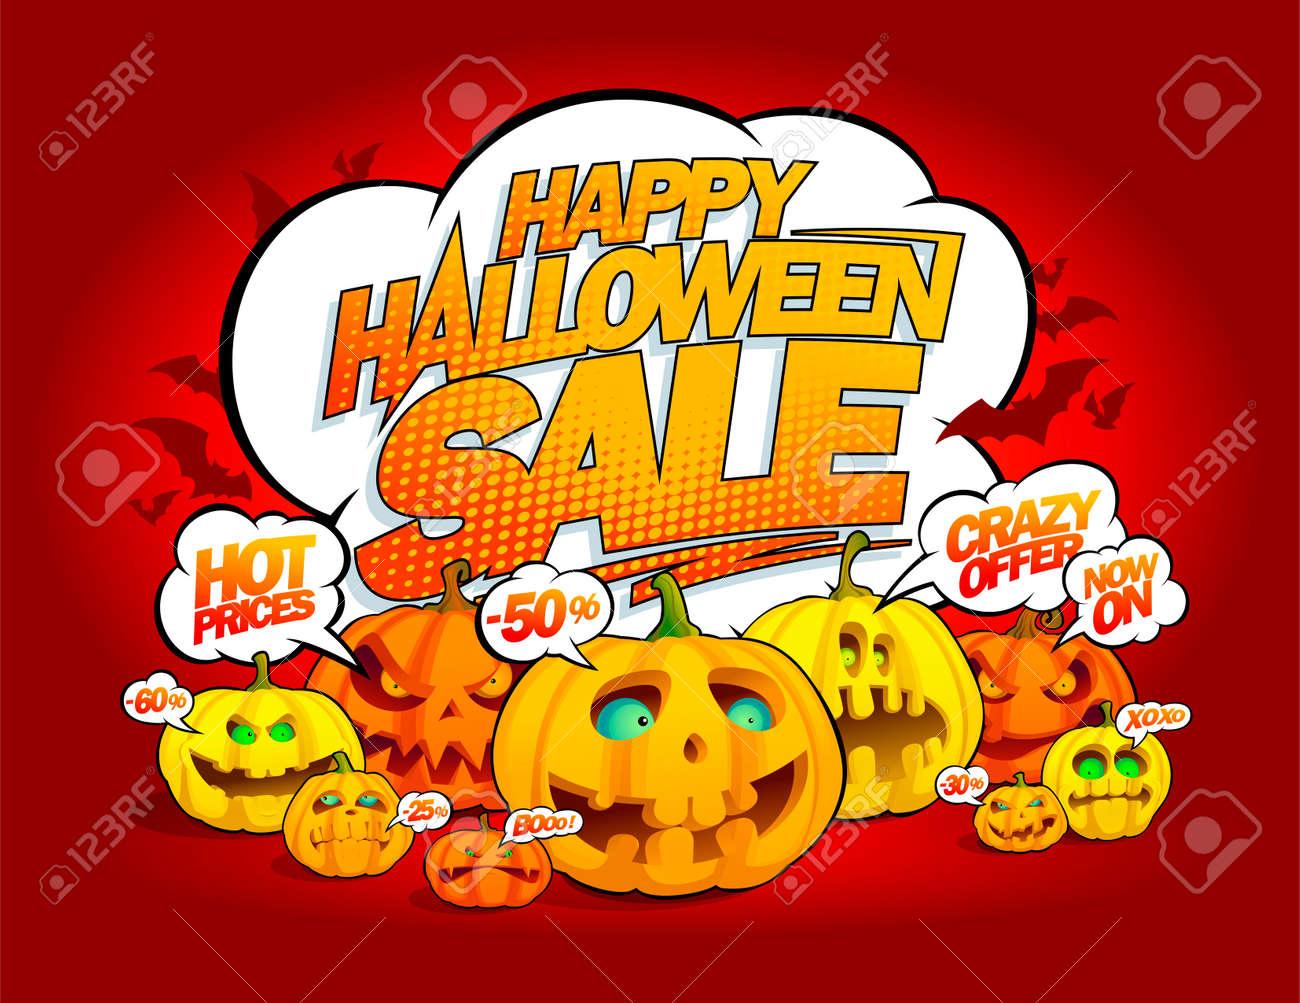 Grunge Halloween sale banner with ghost and pumpkin - Download Free  Vectors, Clipart Graphics & Vector Art